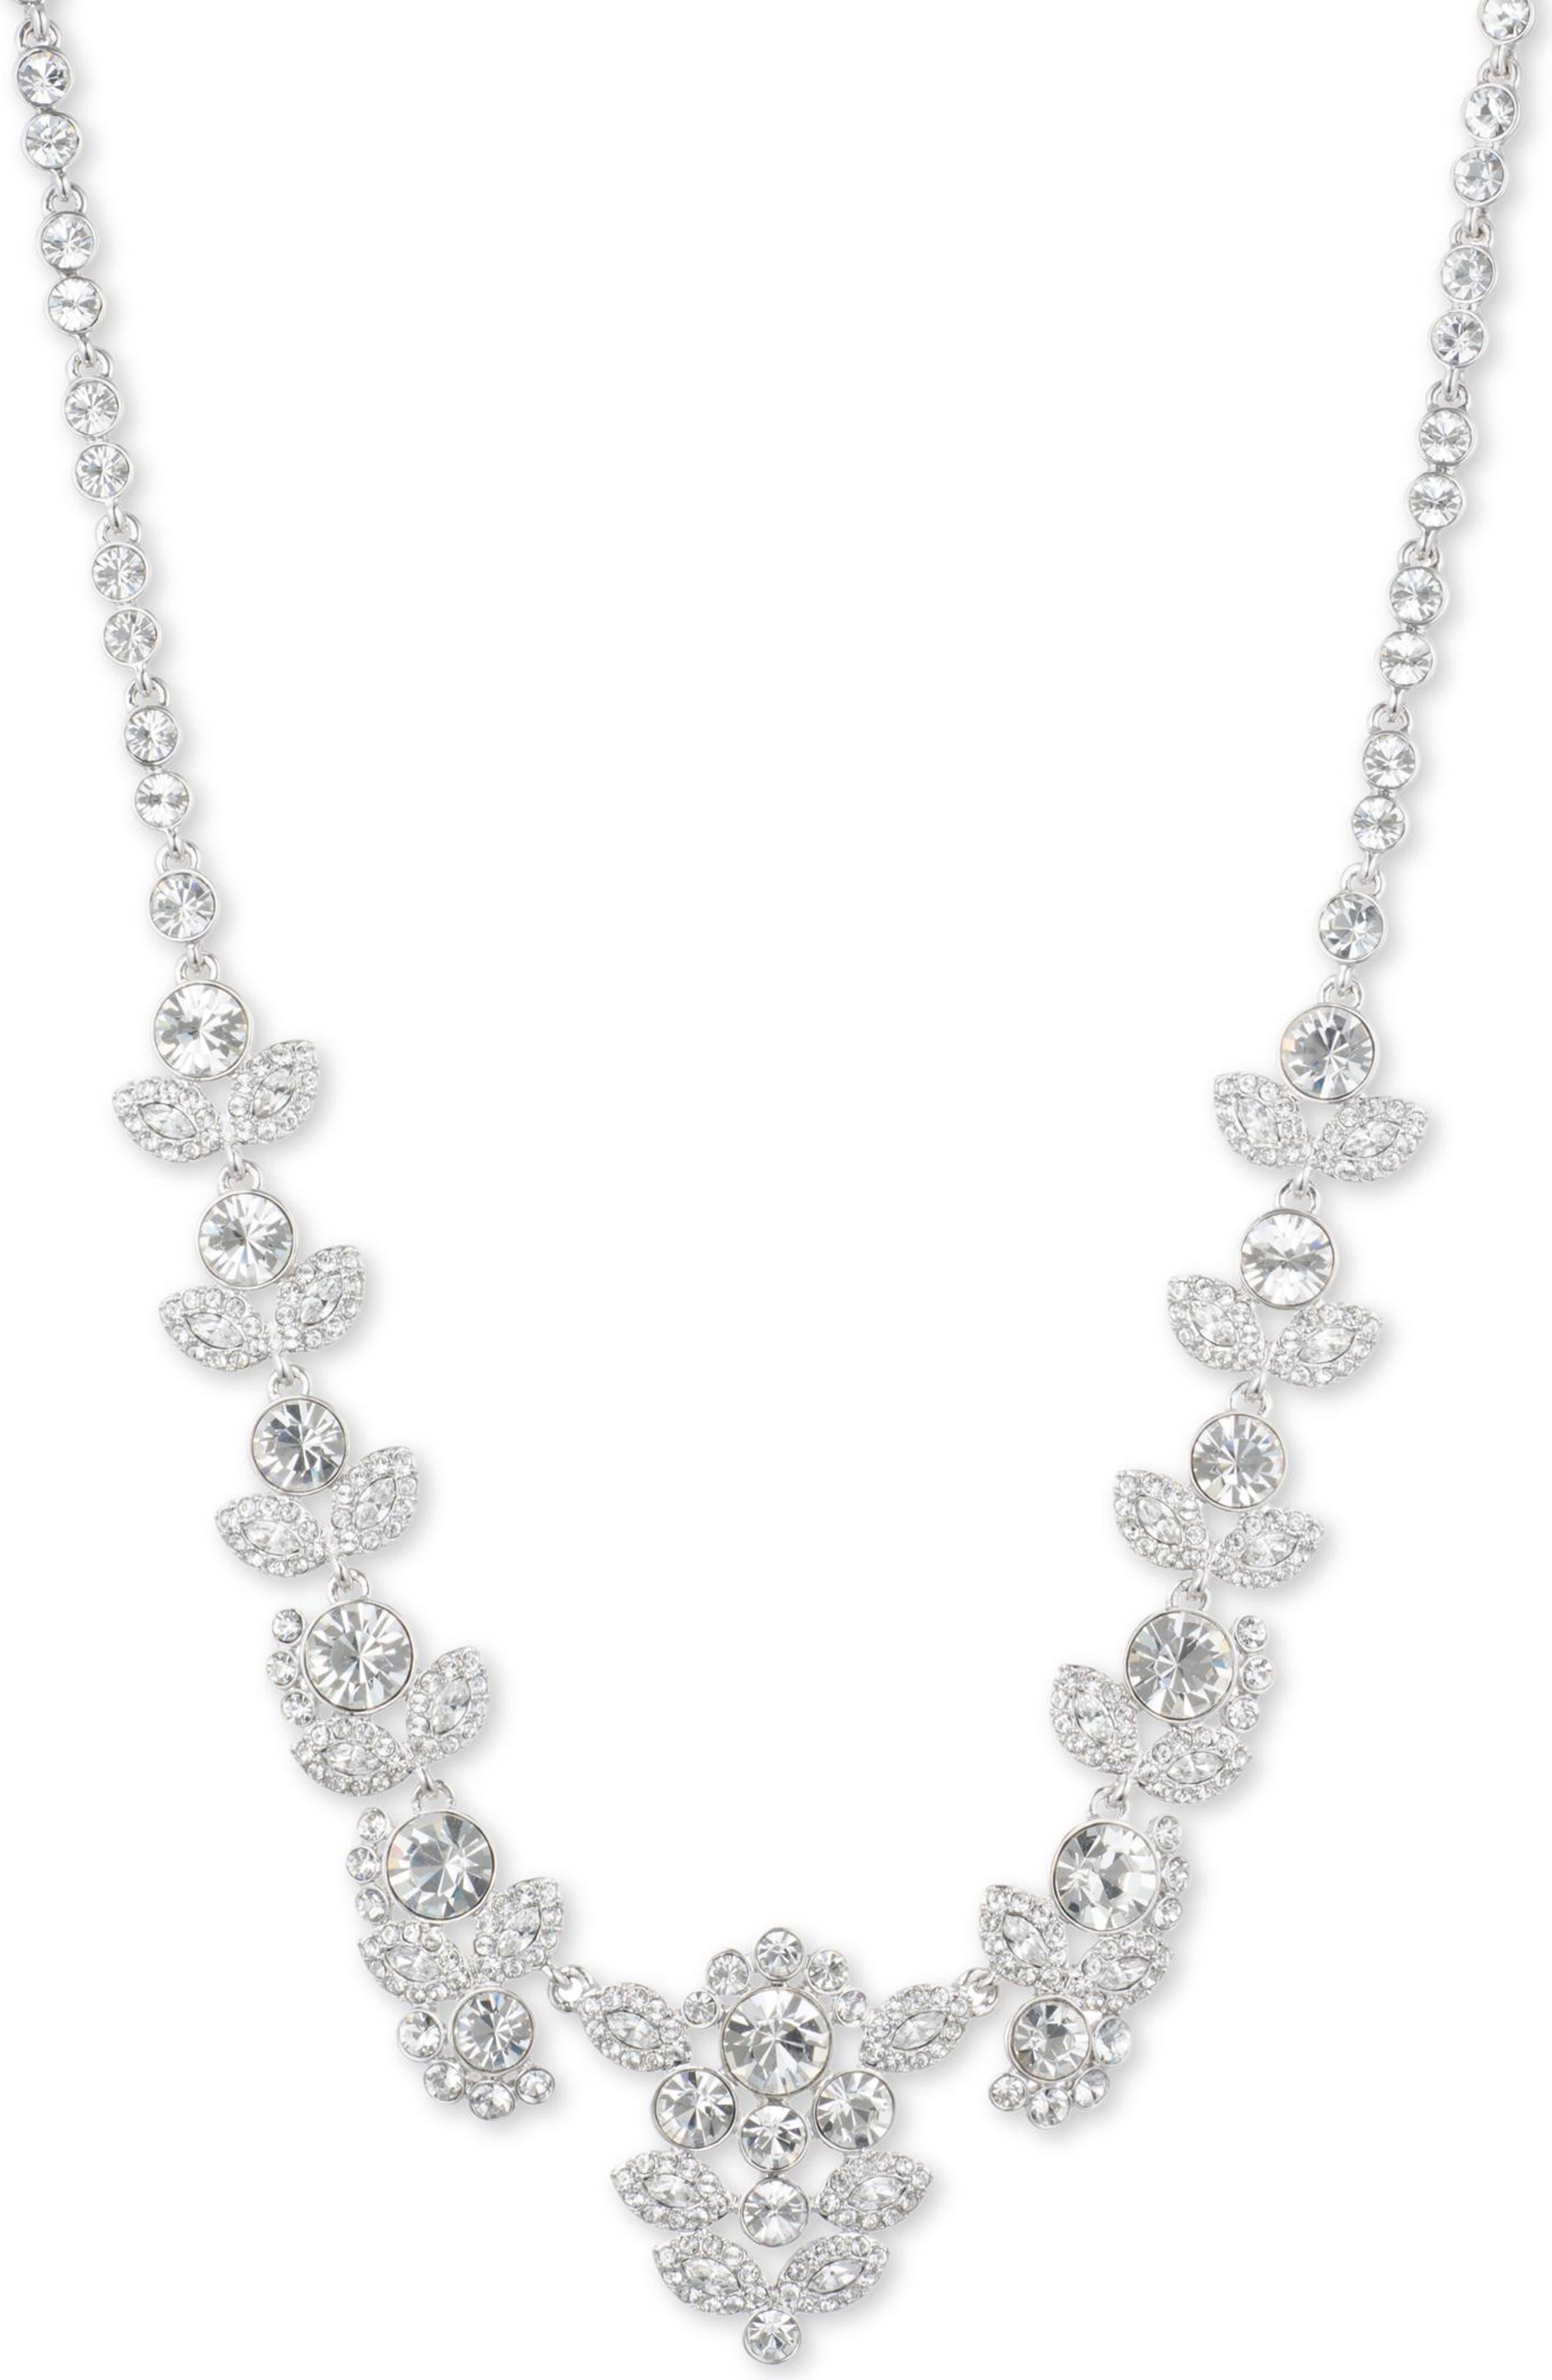 Crystal Collar Necklace,                             Main thumbnail 1, color,                             SILVER